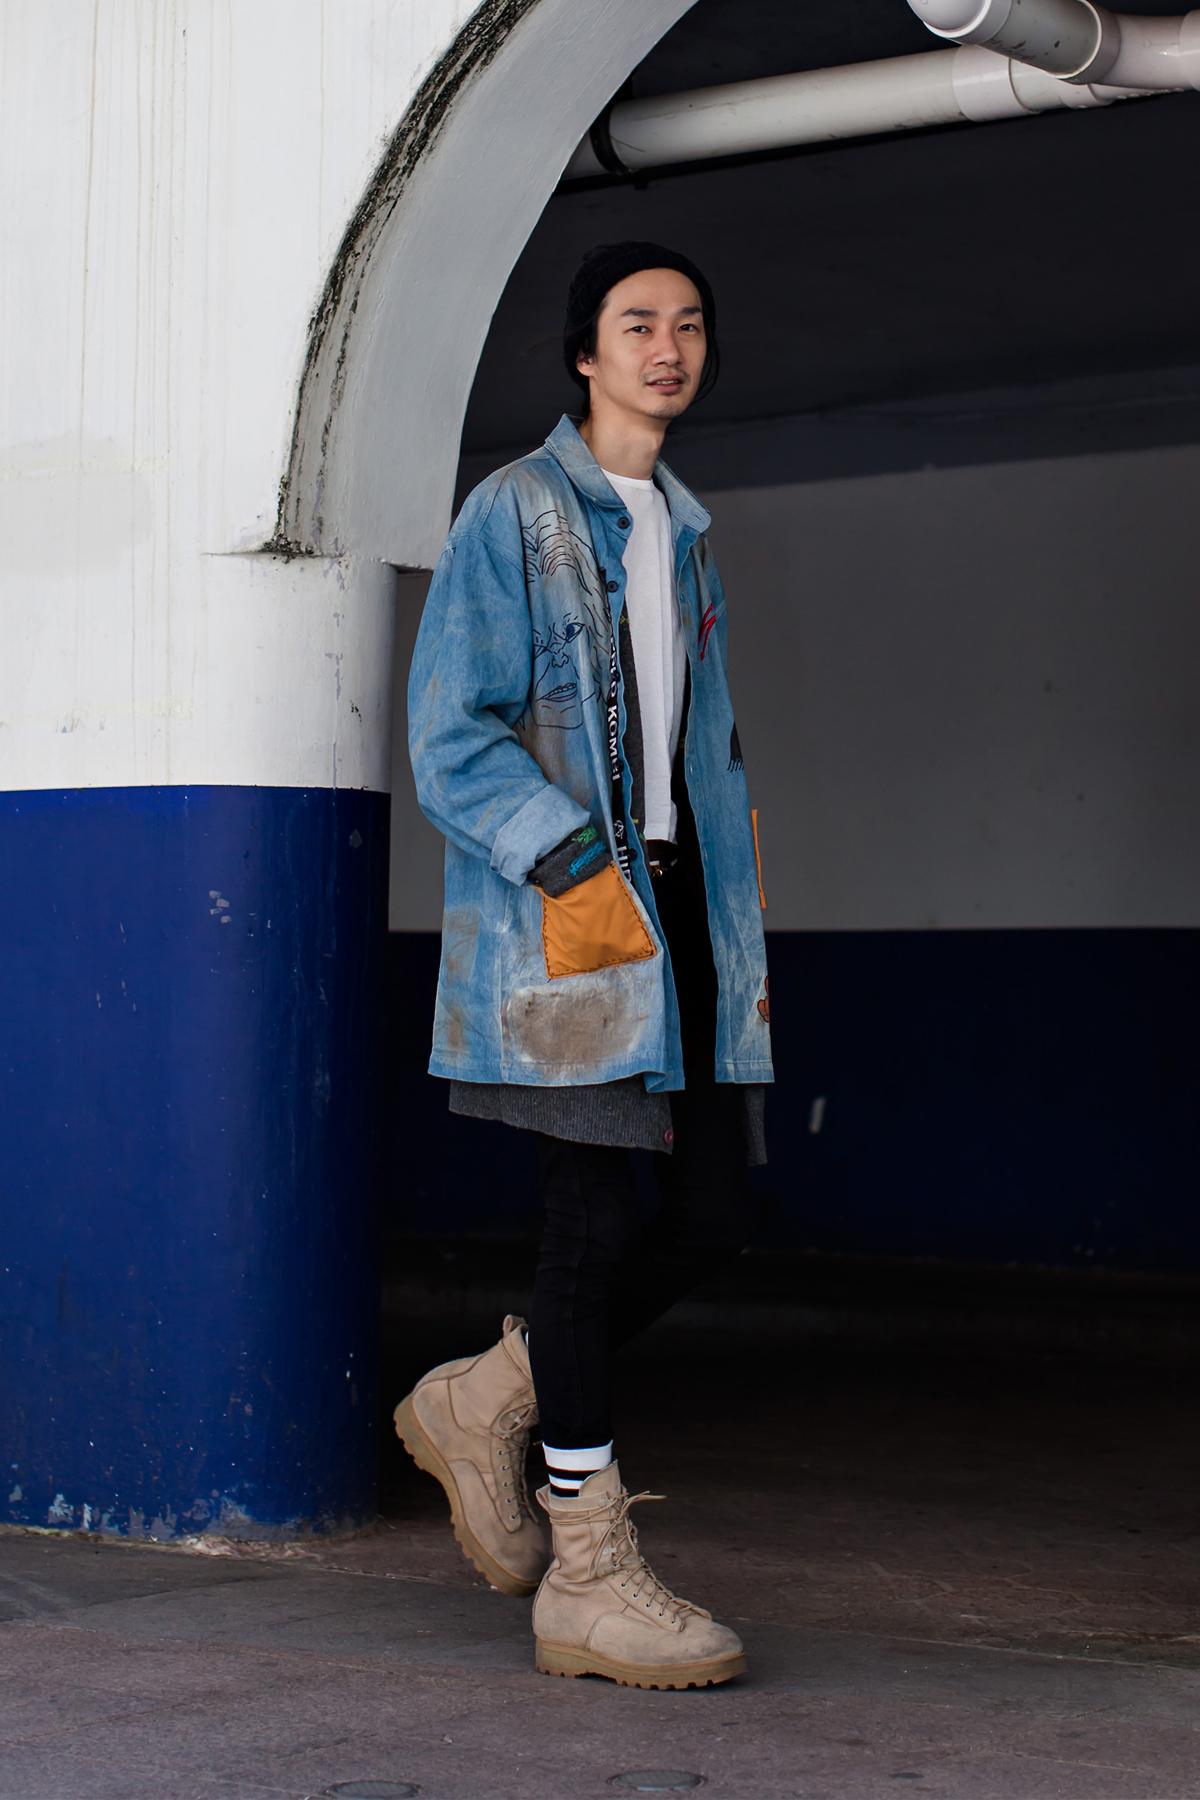 On the street… No Woosang Busan